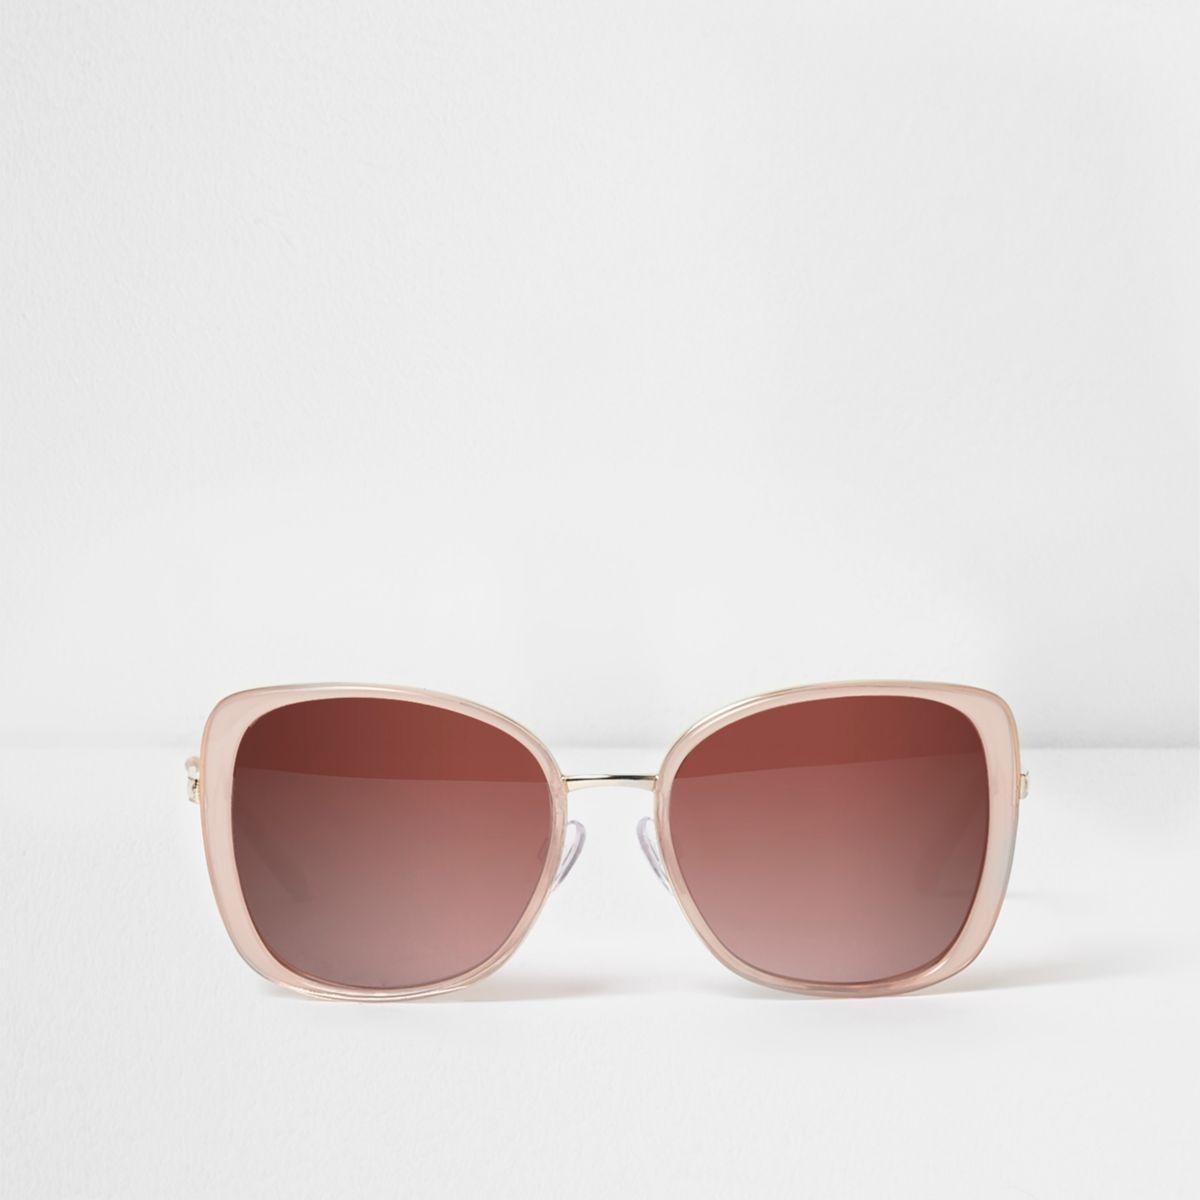 Pink plastic square frame glam sunglasses